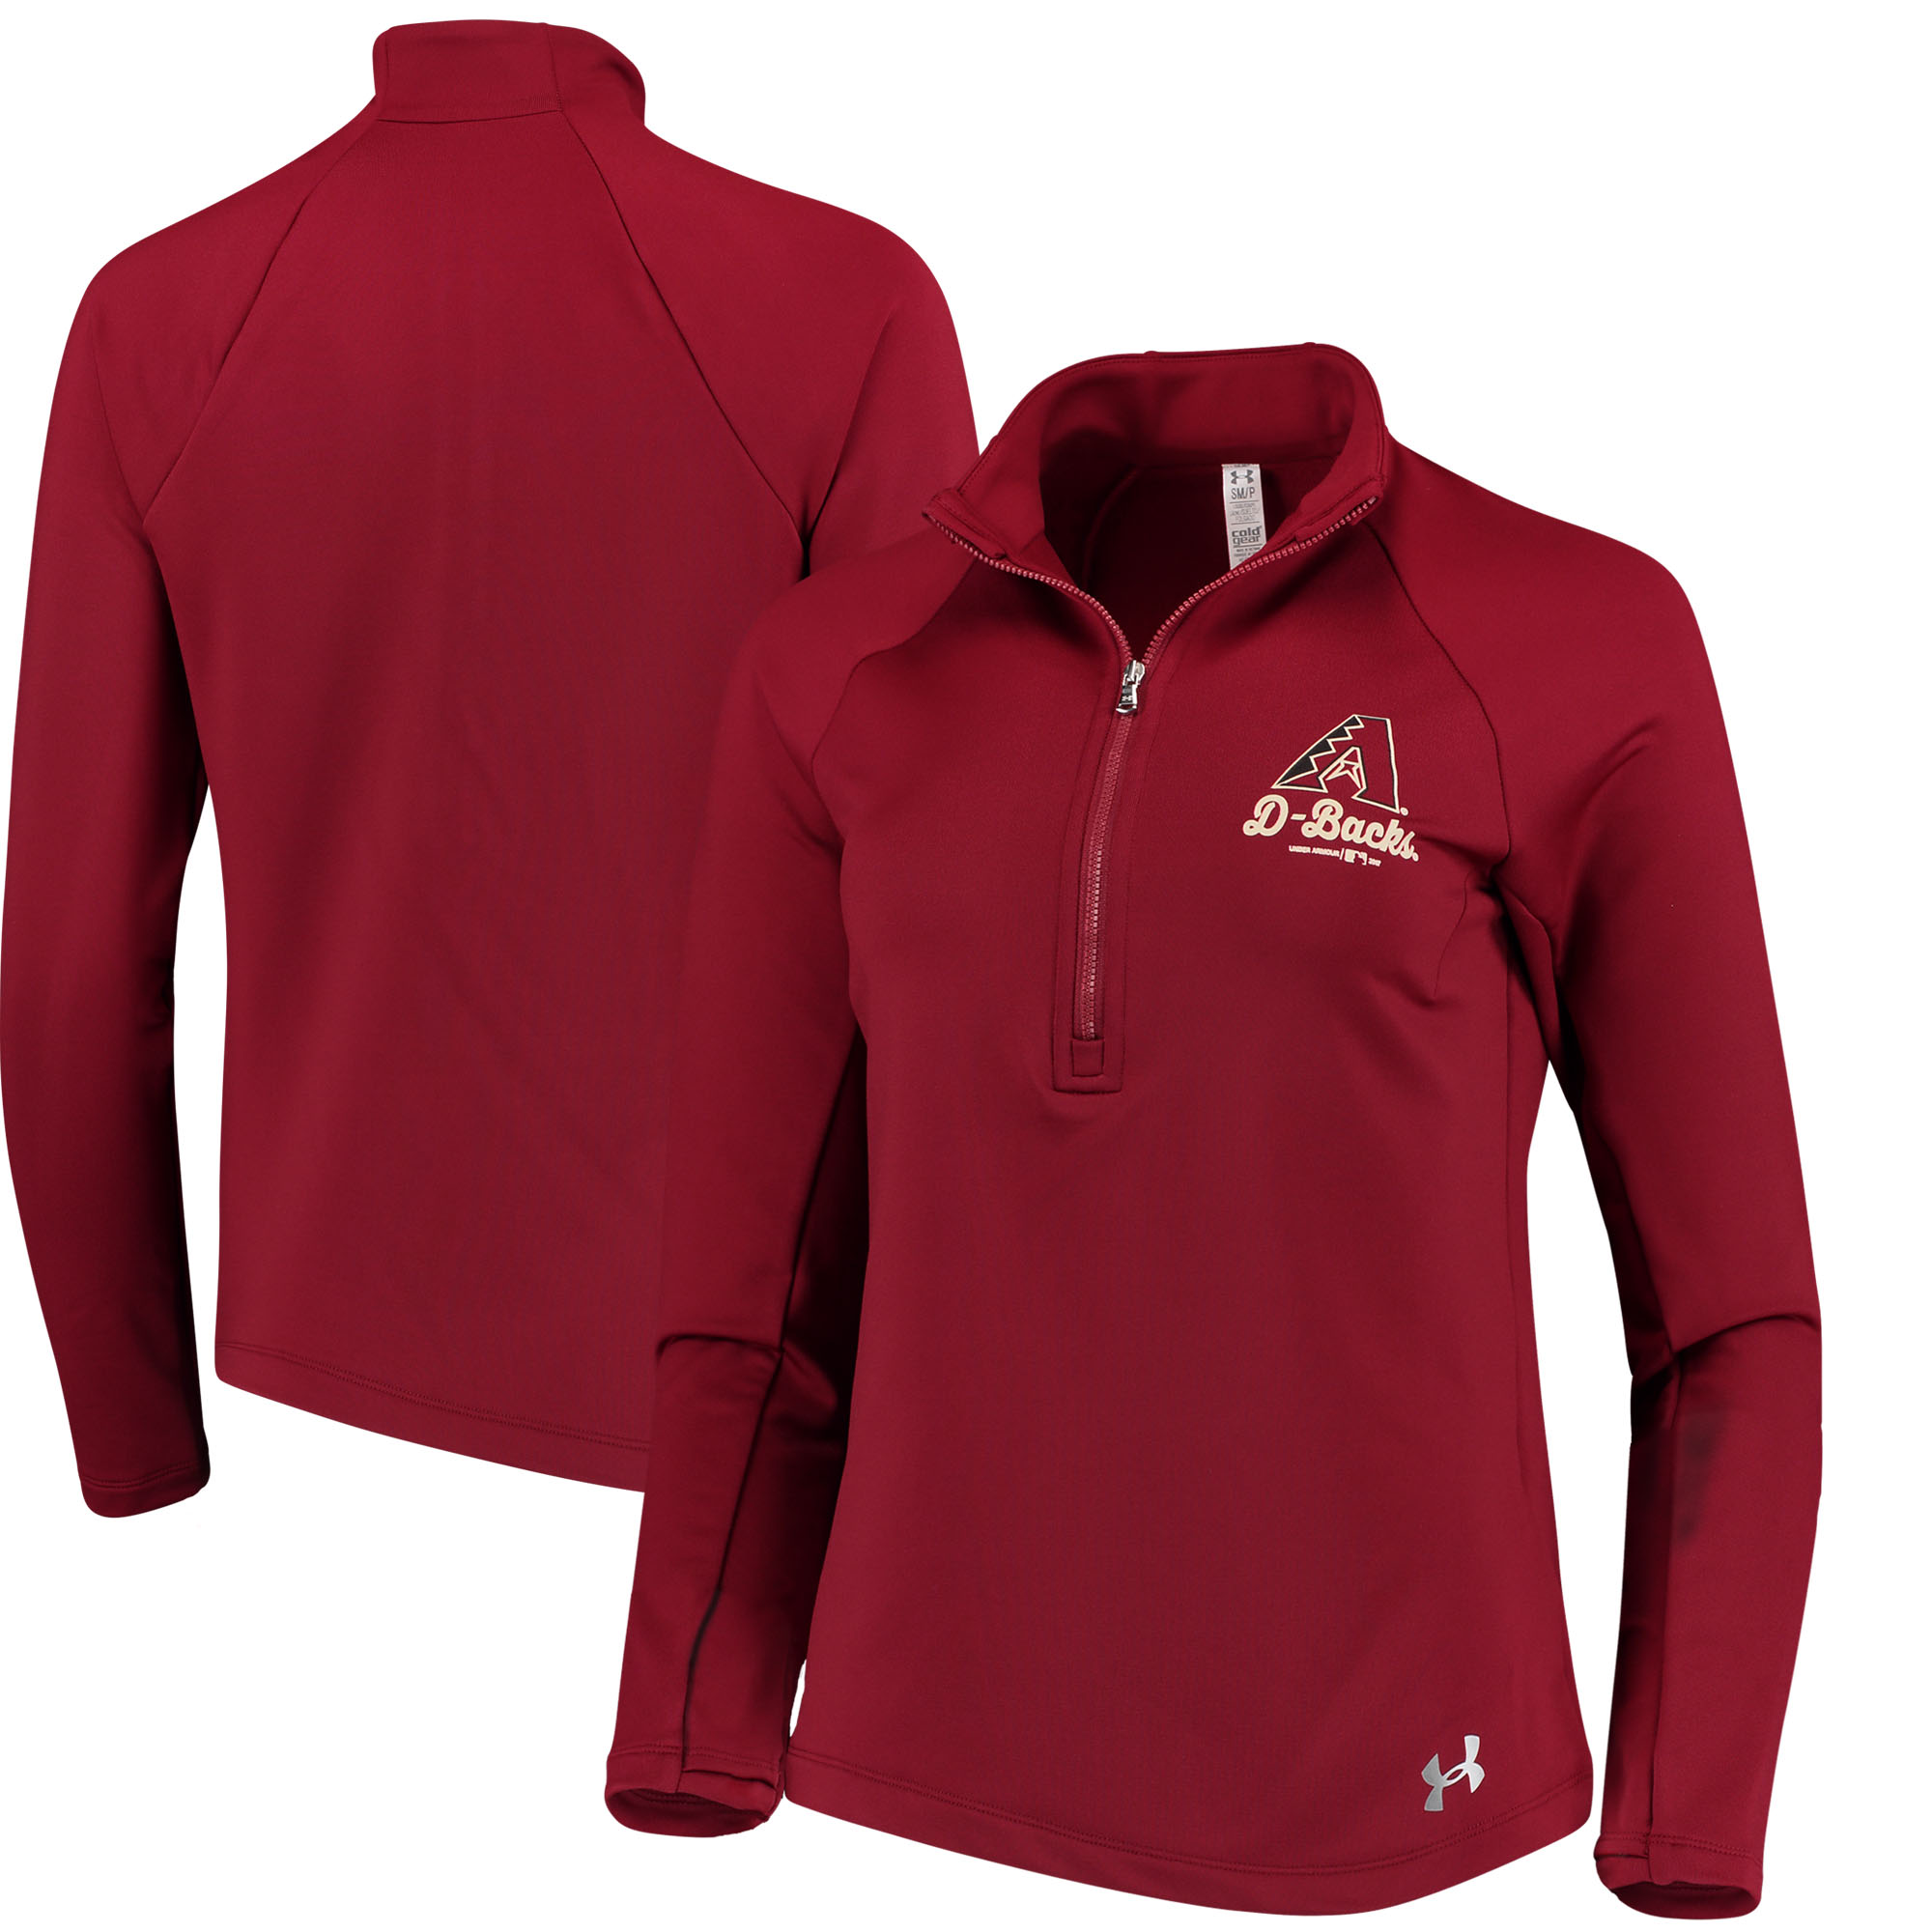 Arizona Diamondbacks Under Armour Women's Team Logo Half-Zip Performance Jacket - Crimson